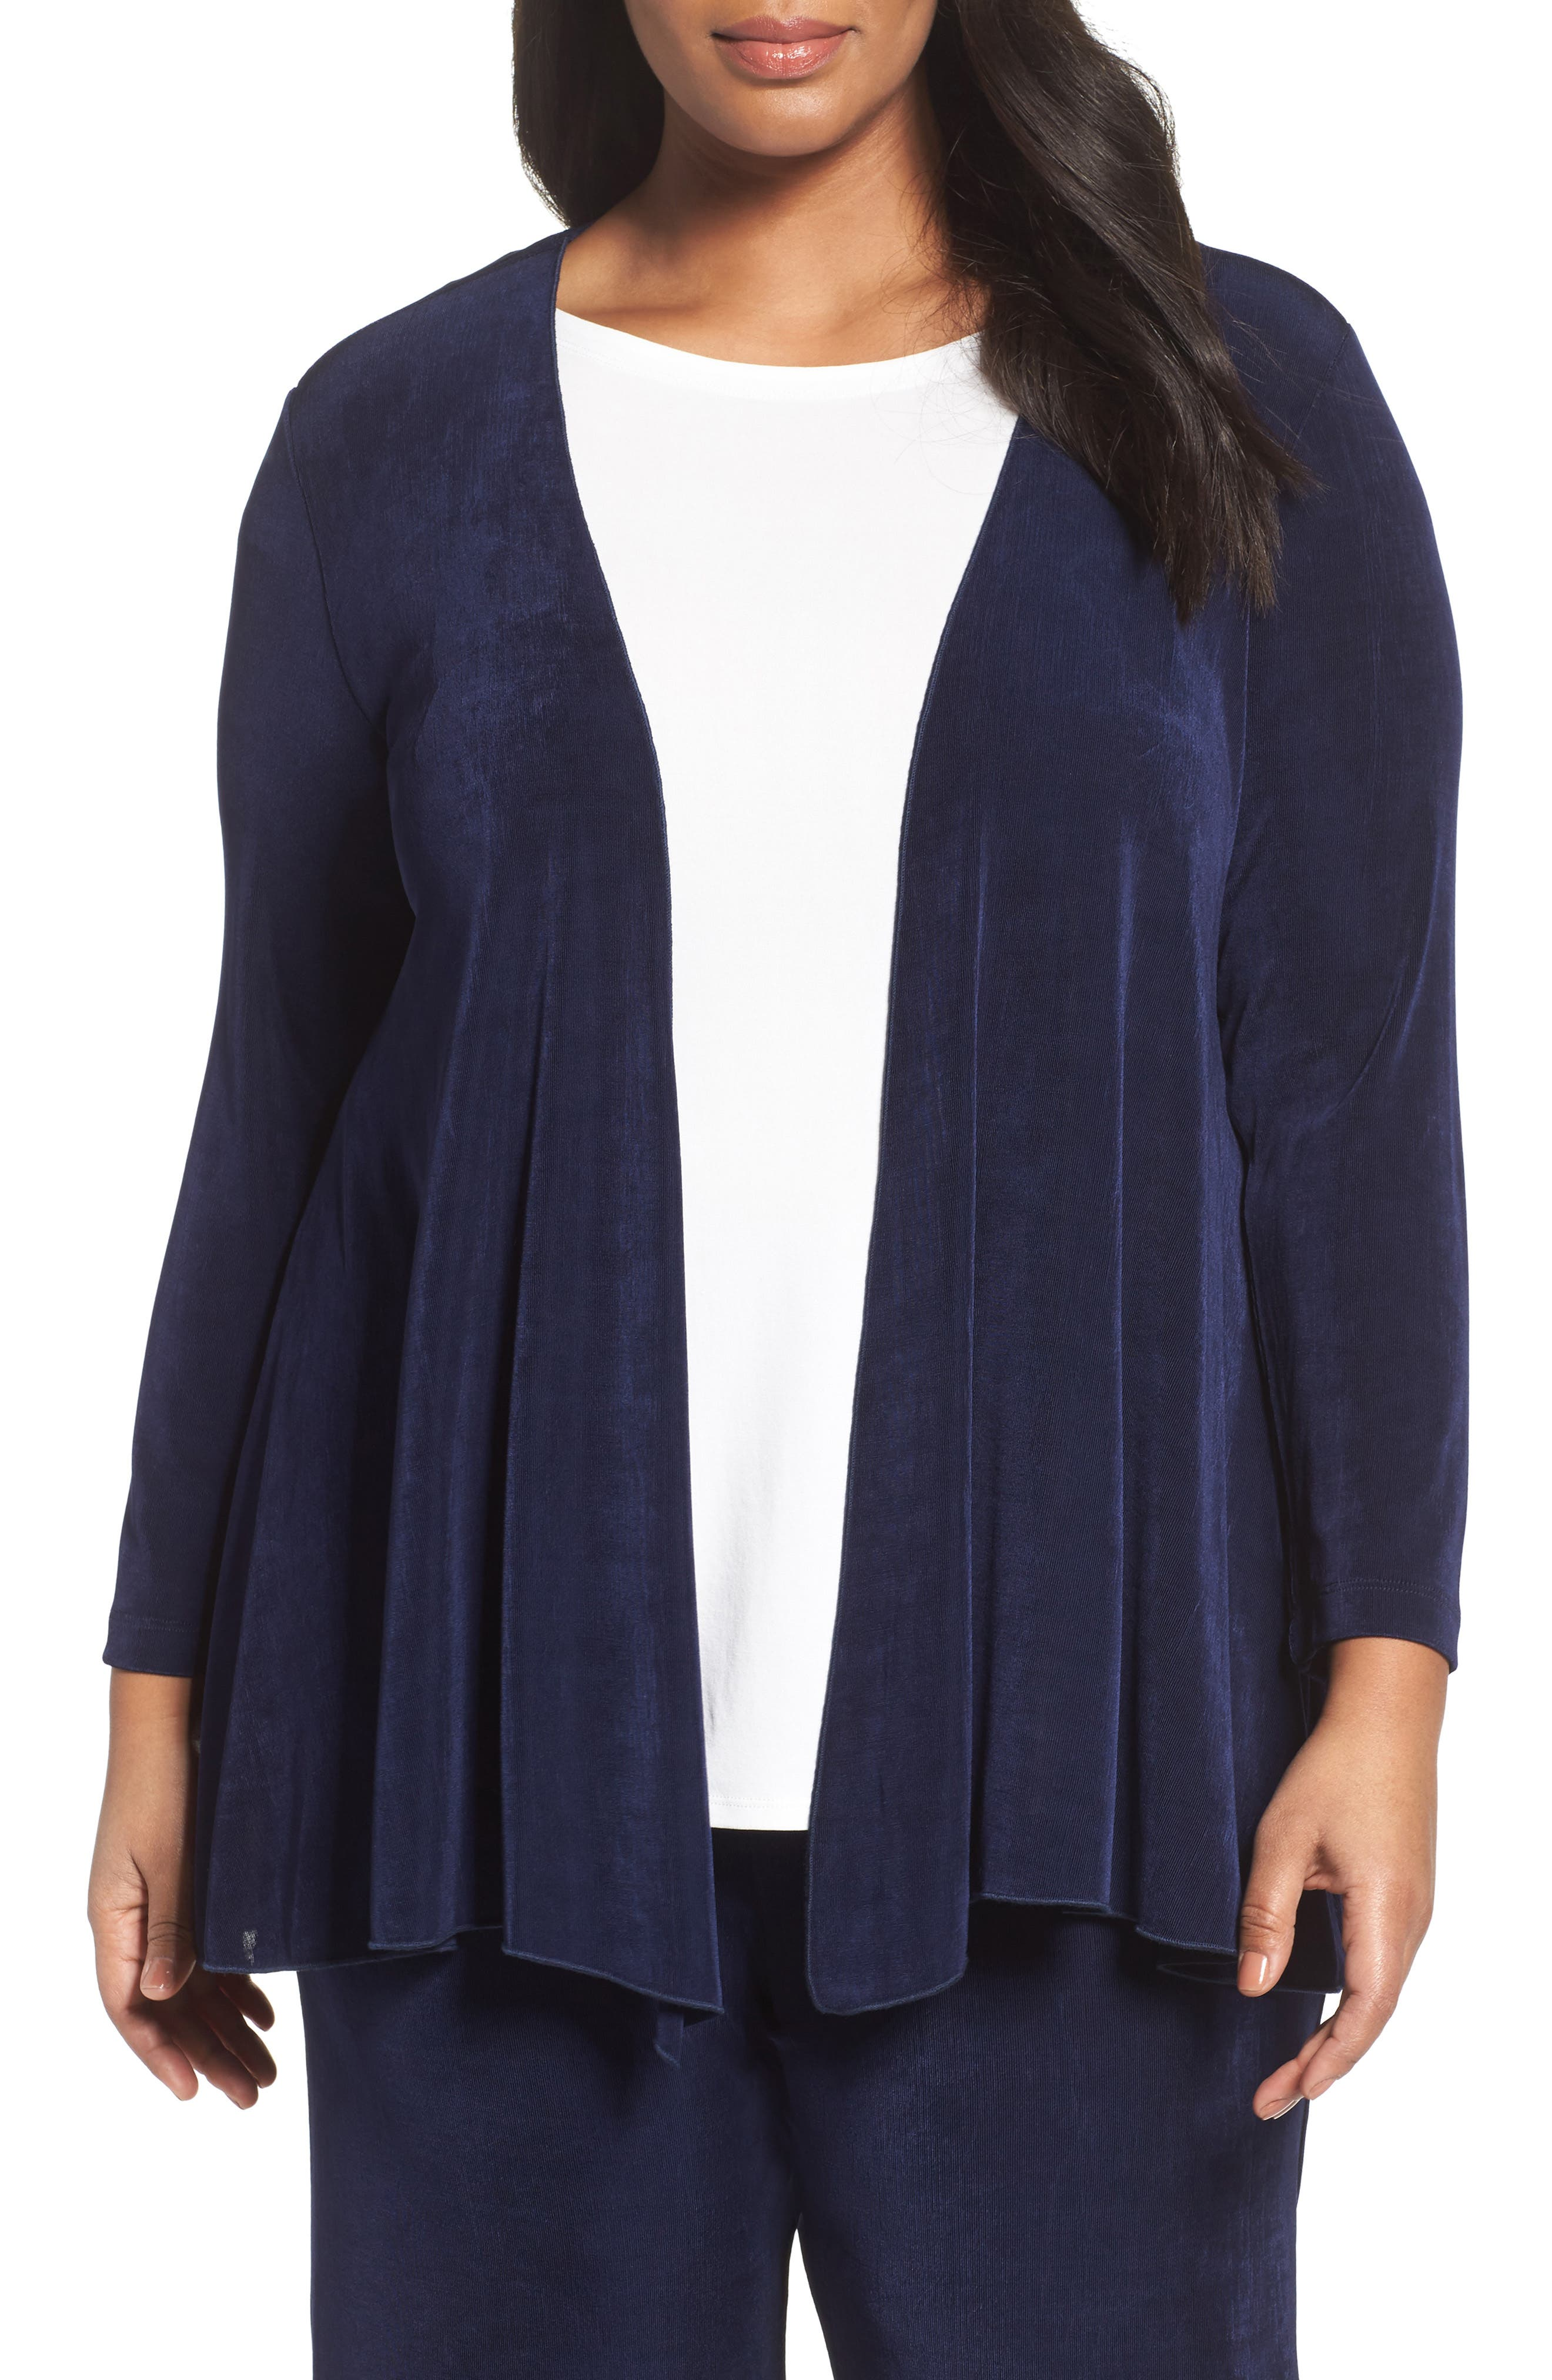 Main Image - Vikki Vi Open Front Swing Cardigan (Plus Size)